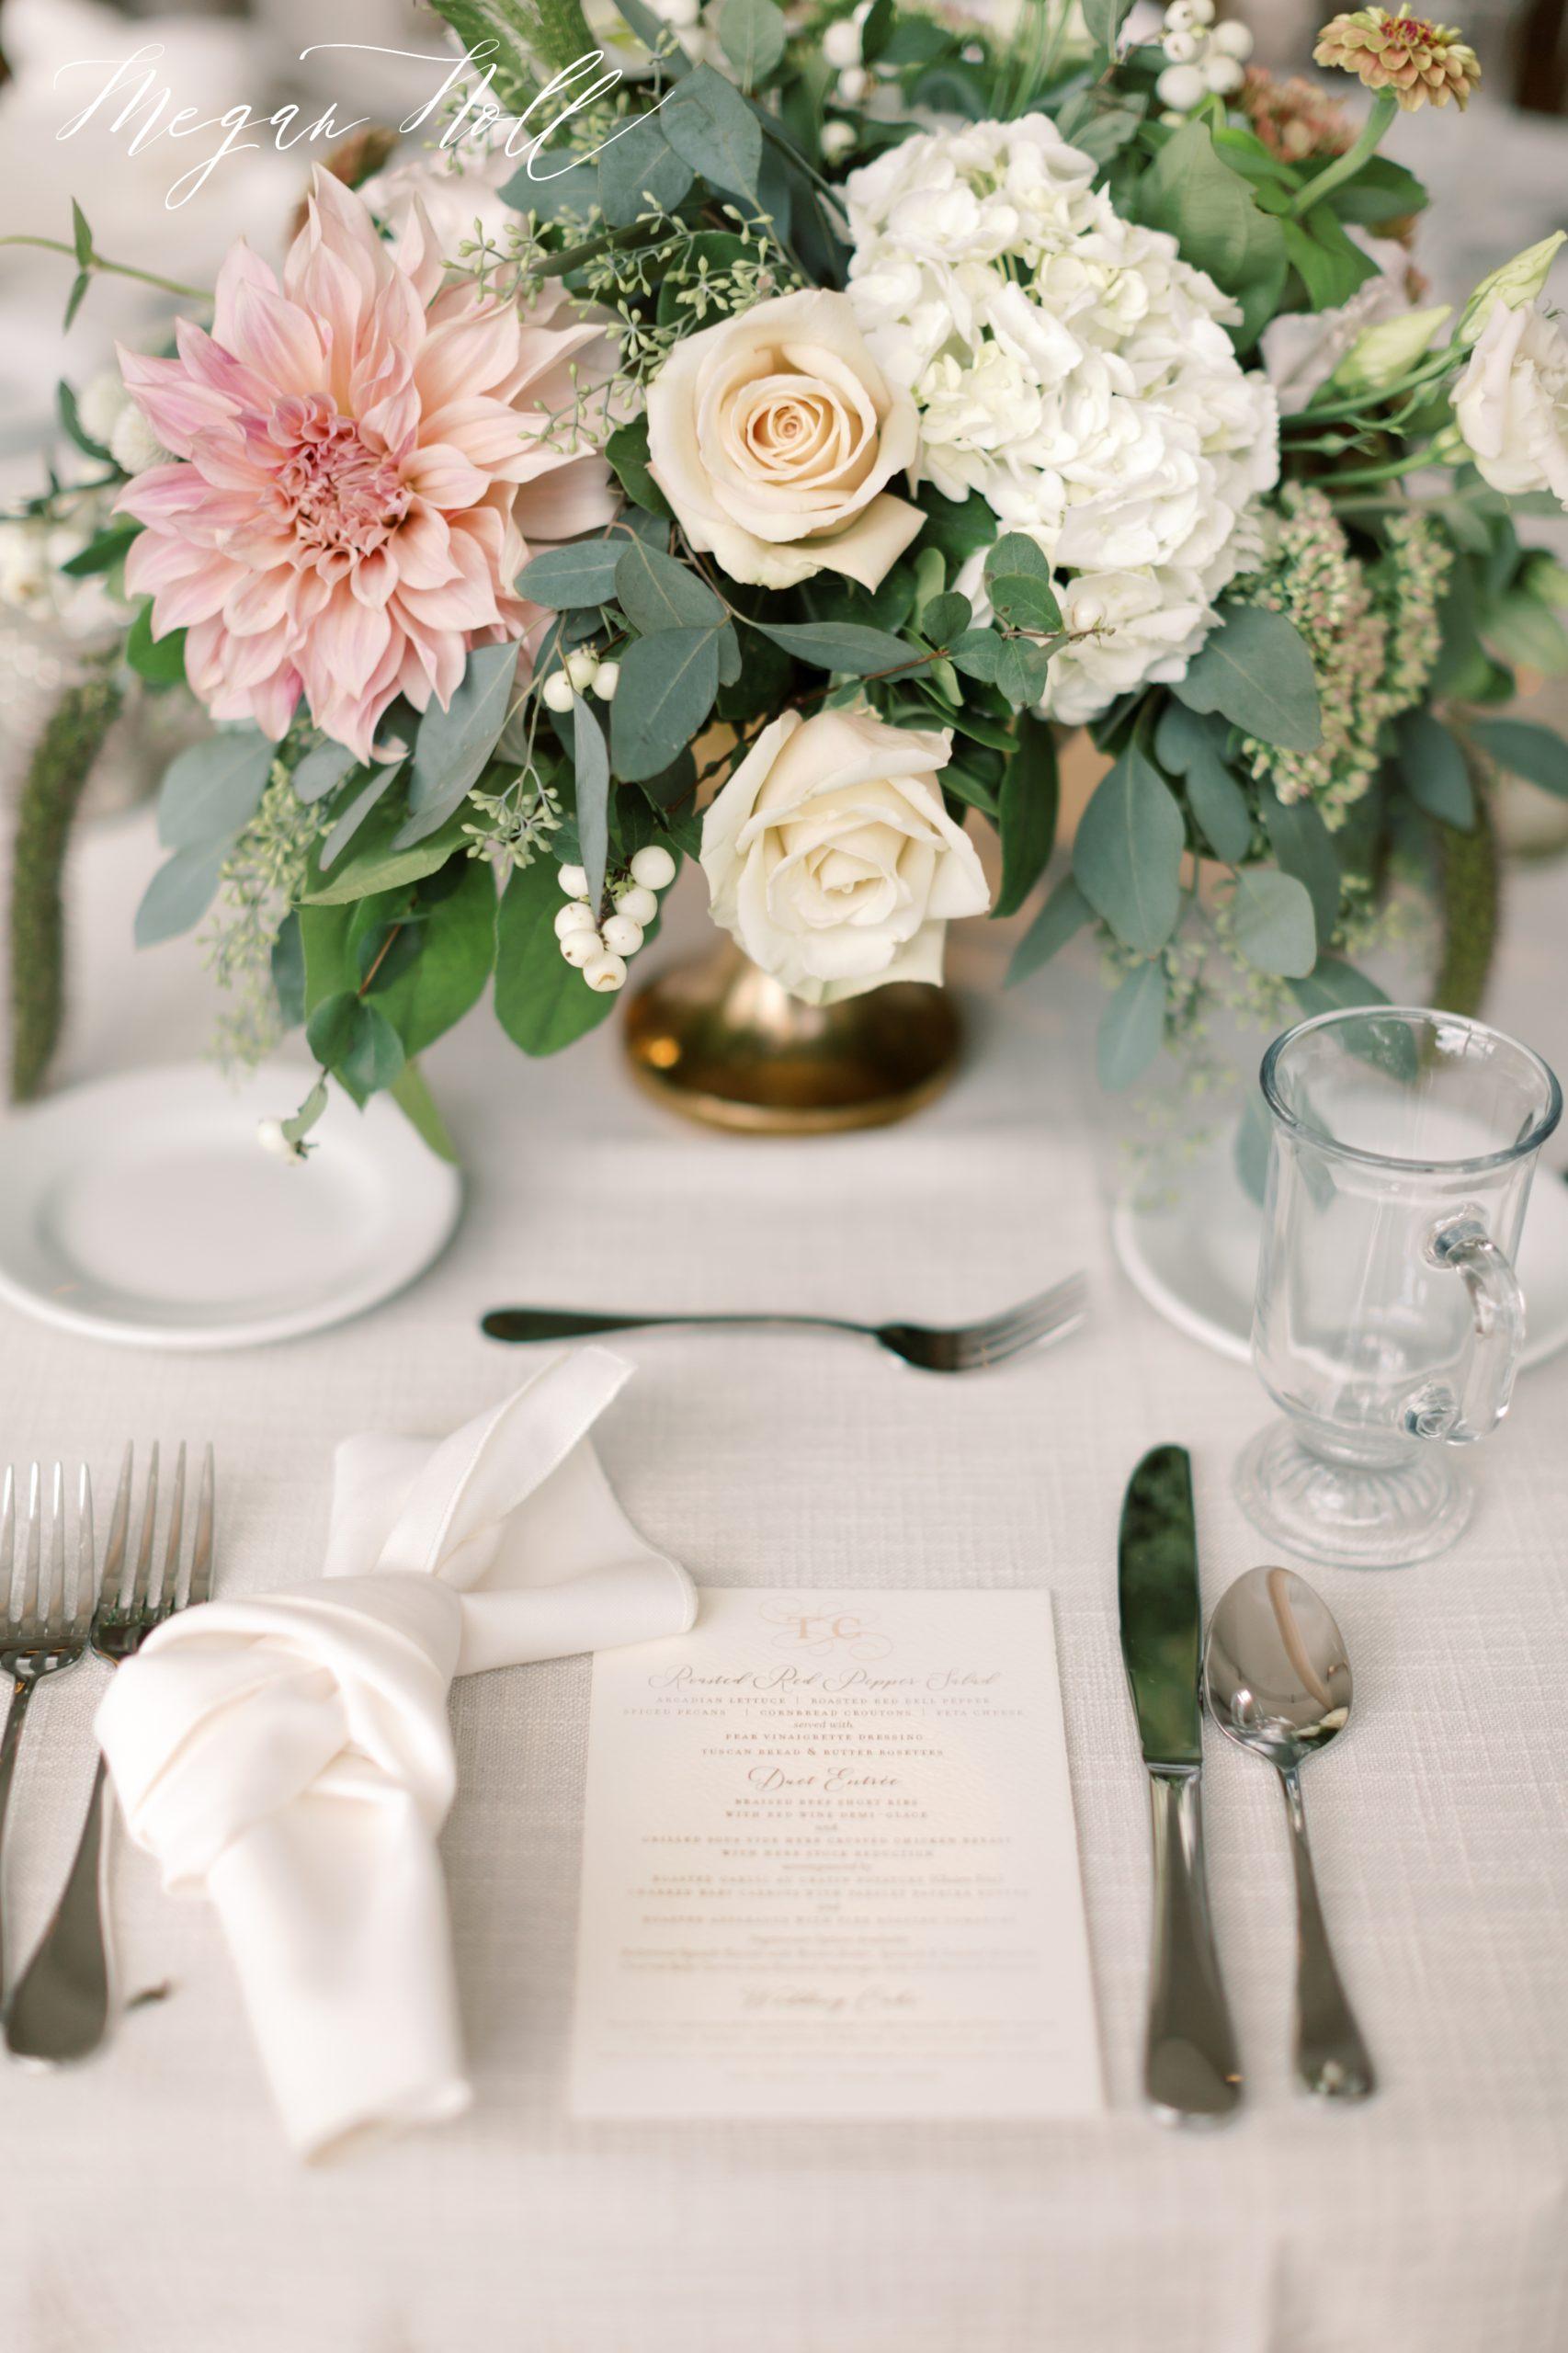 Table scape, place setting at Zasuwa Wedding